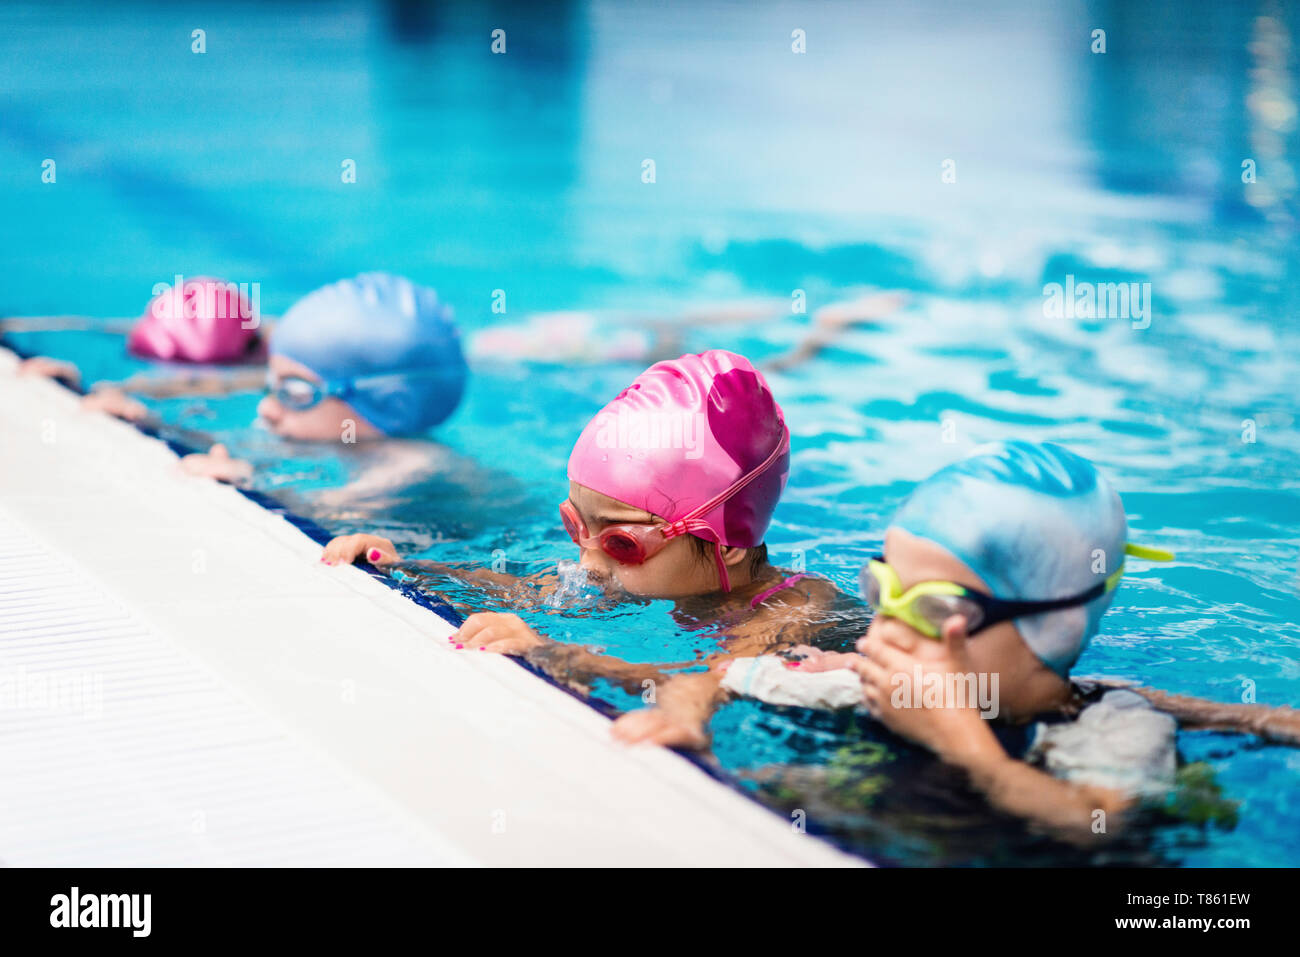 Niños al borde de la piscina Foto de stock